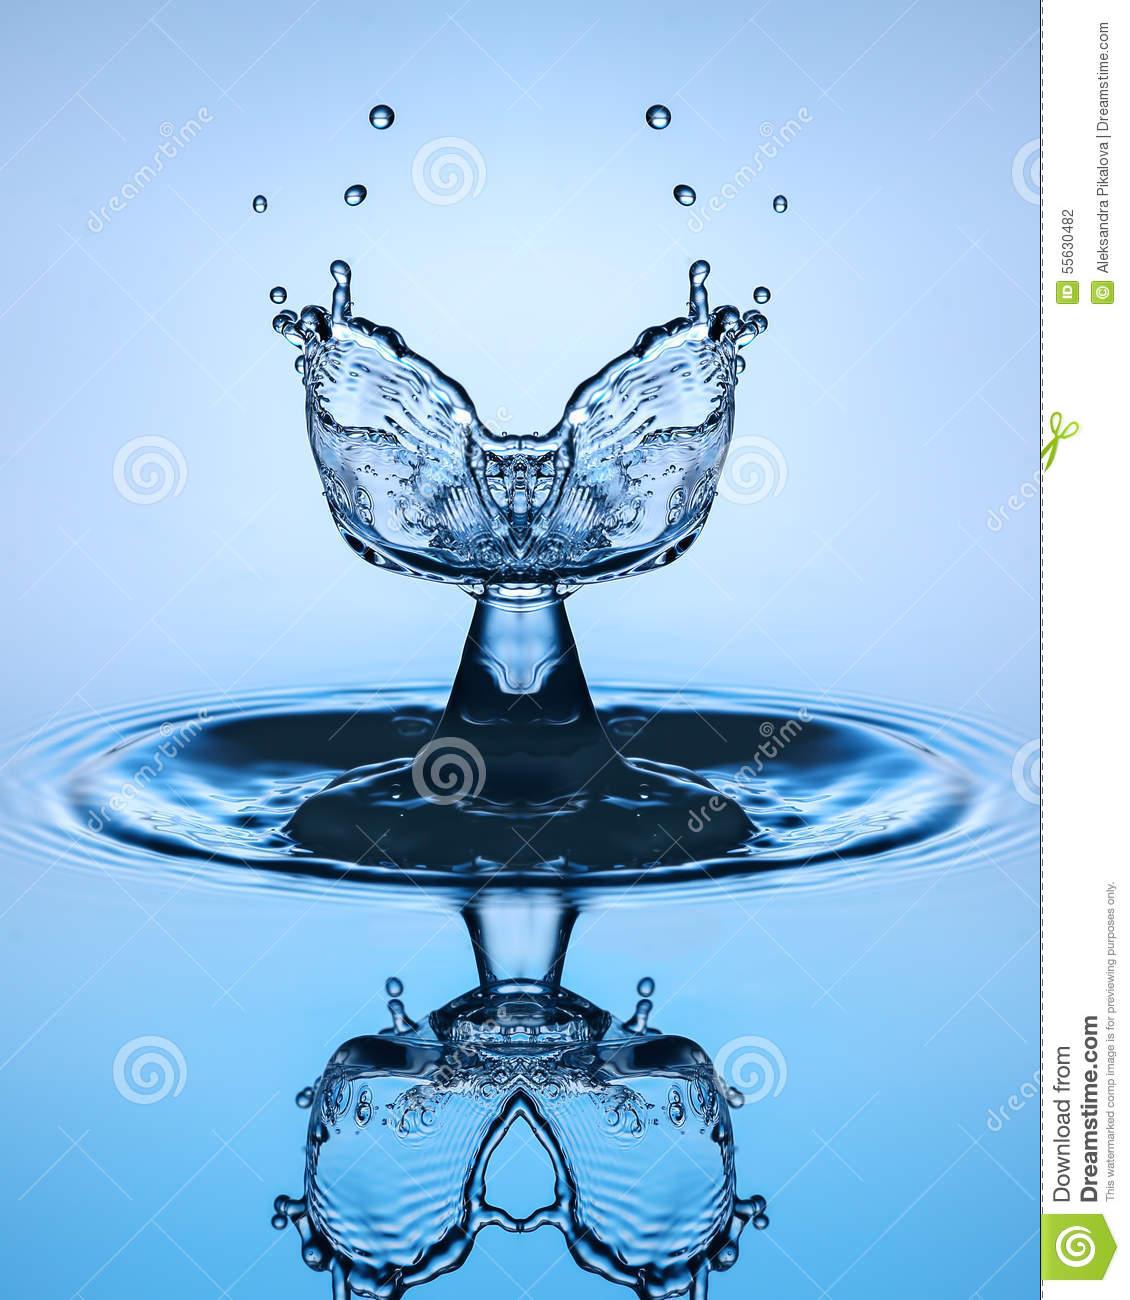 Water Drop Close Up. Water Sculpture. Stock Photo.